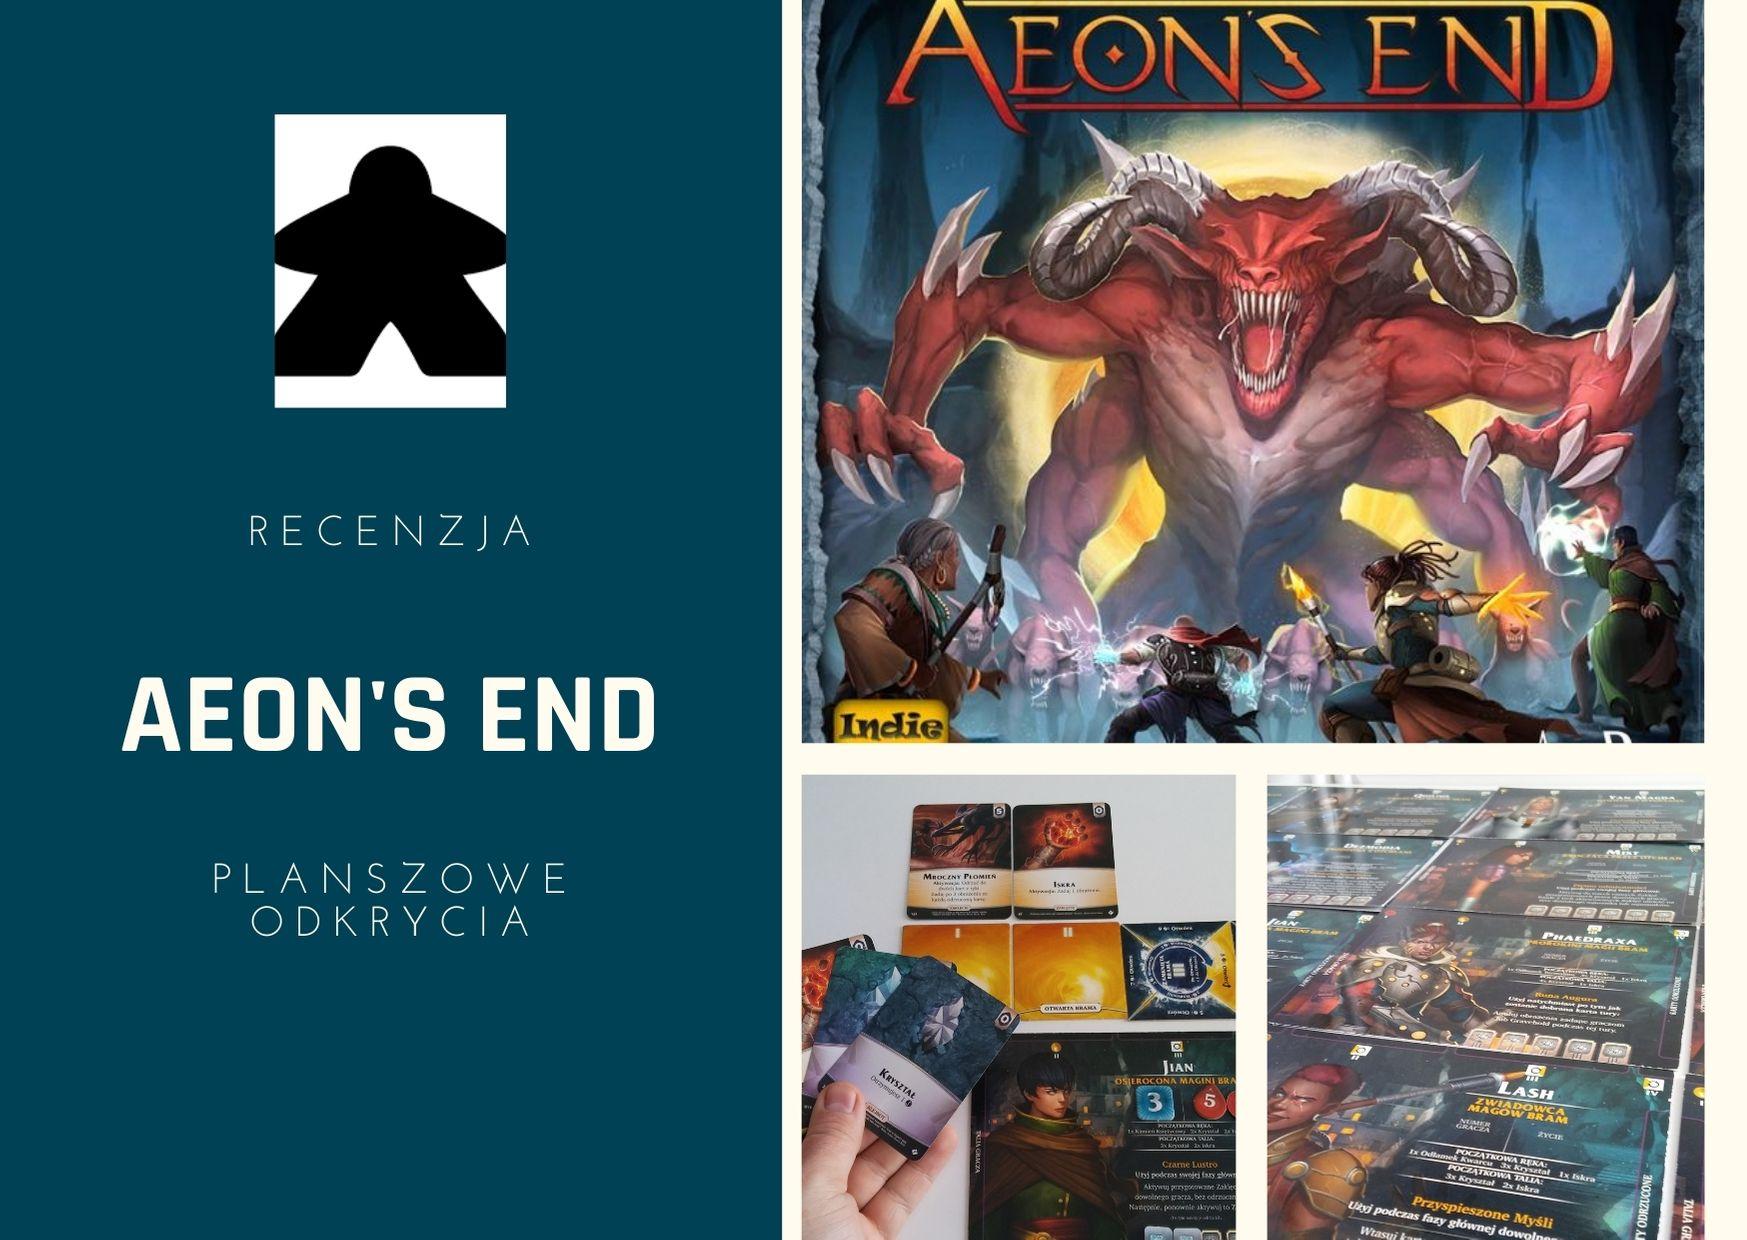 Aeon's end recenzja